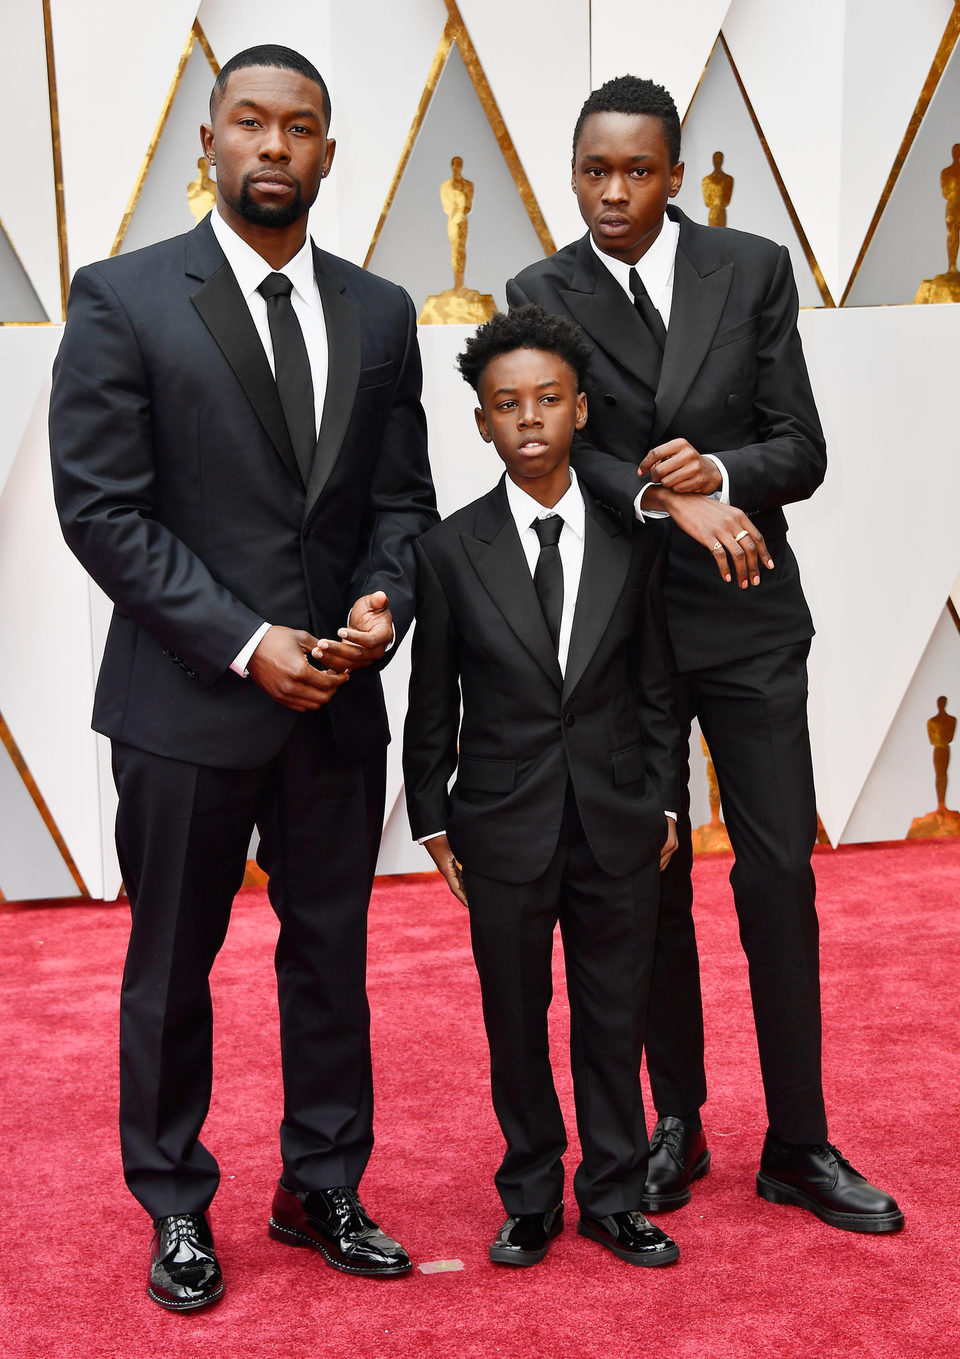 Trevante Rhodes, Alex R. Hibbert and Ashton Sanders at the Oscars 2017 red carpet